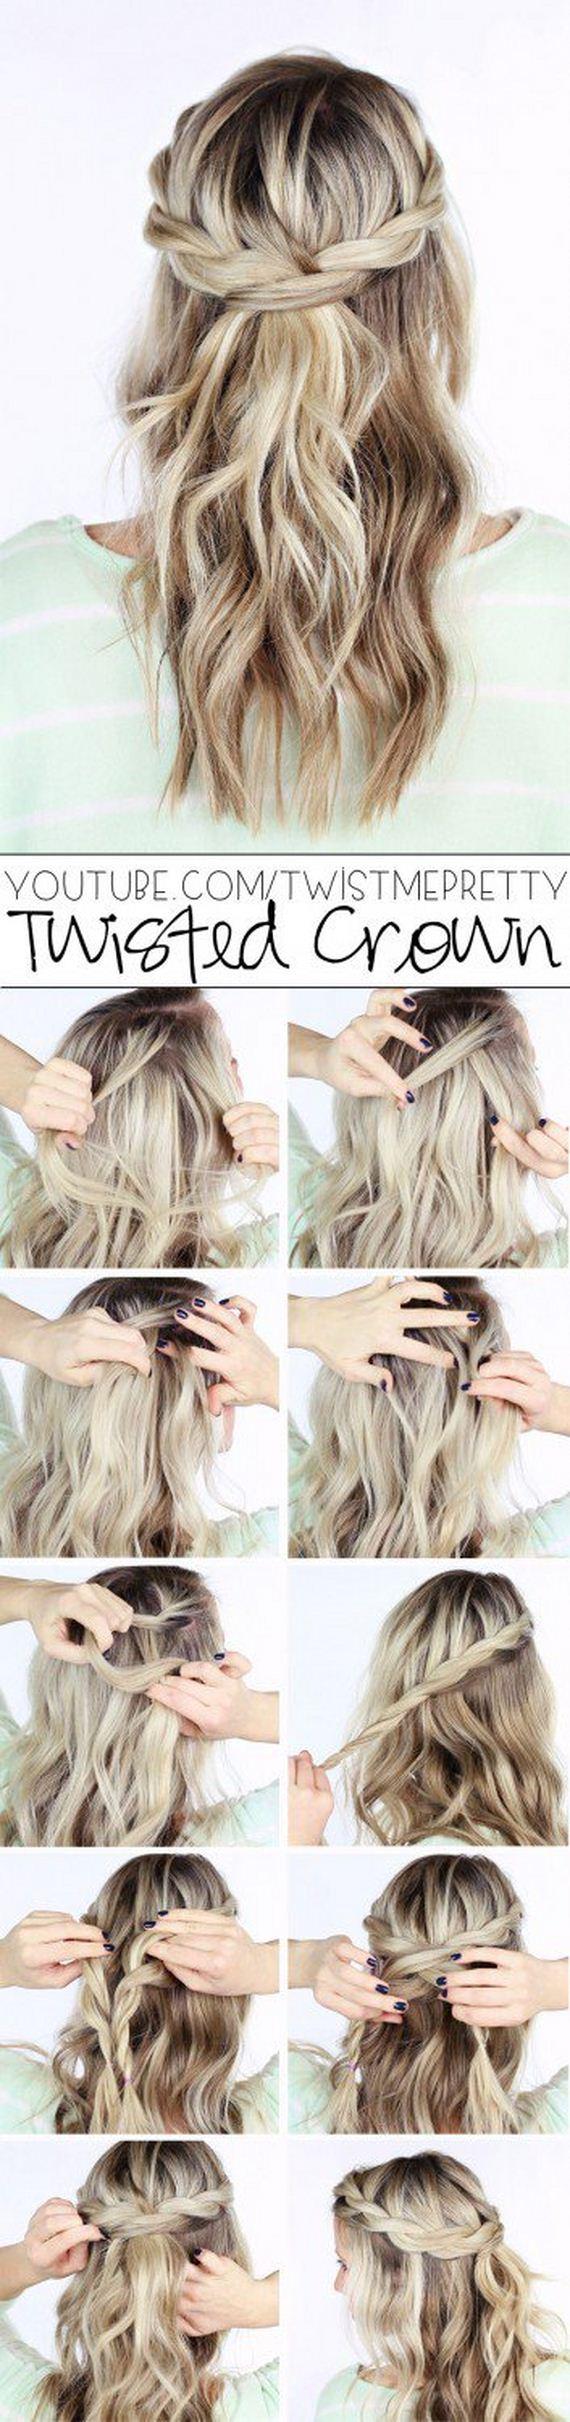 10-DIY-Hairstyles-for-Long-Hair